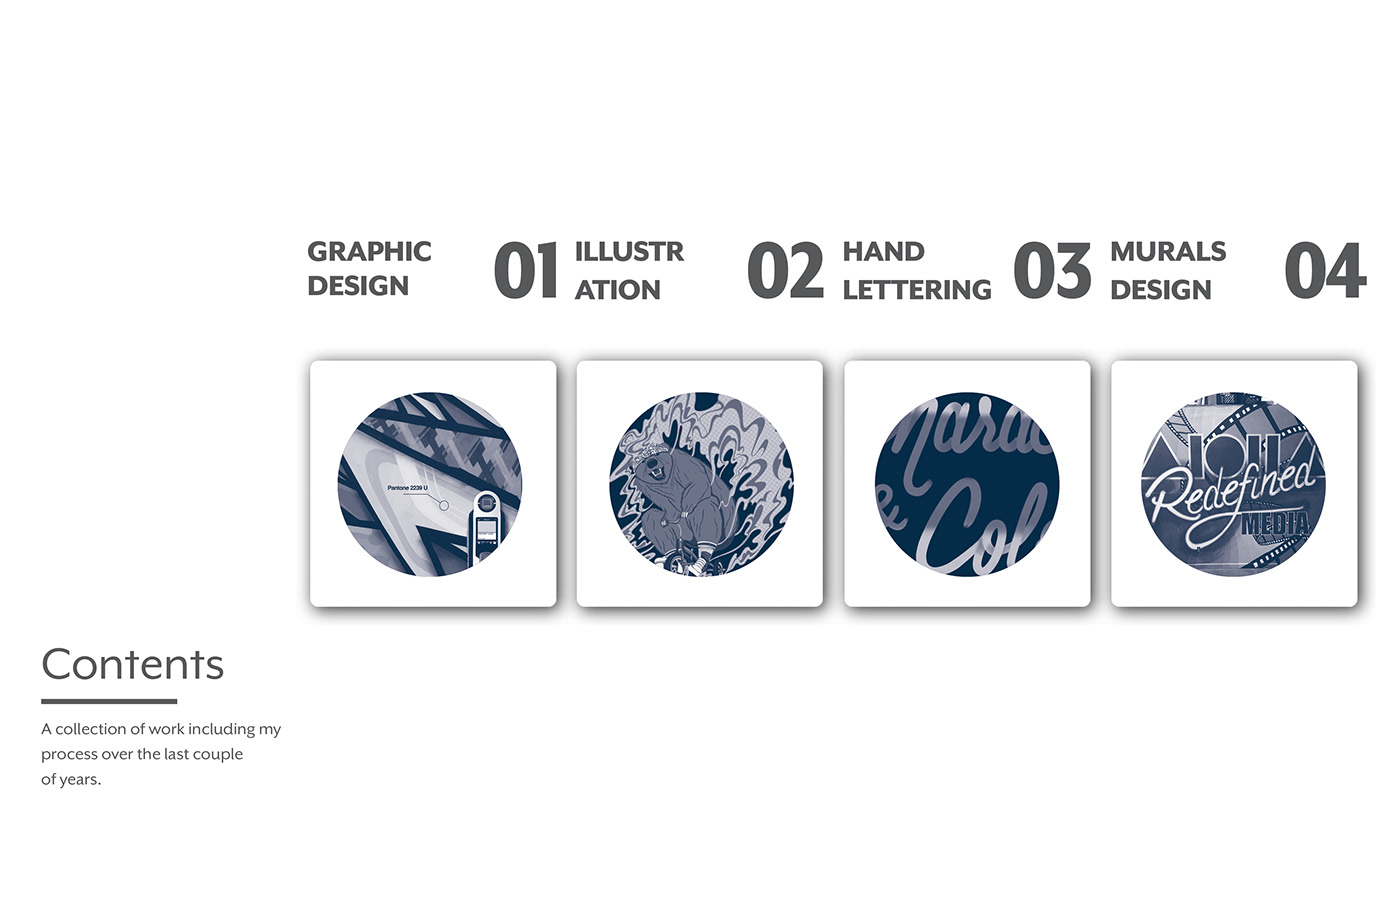 graphic design  ILLUSTRATION  Illustrator InDesign Layout logo Mural photoshop portfolio Stationery